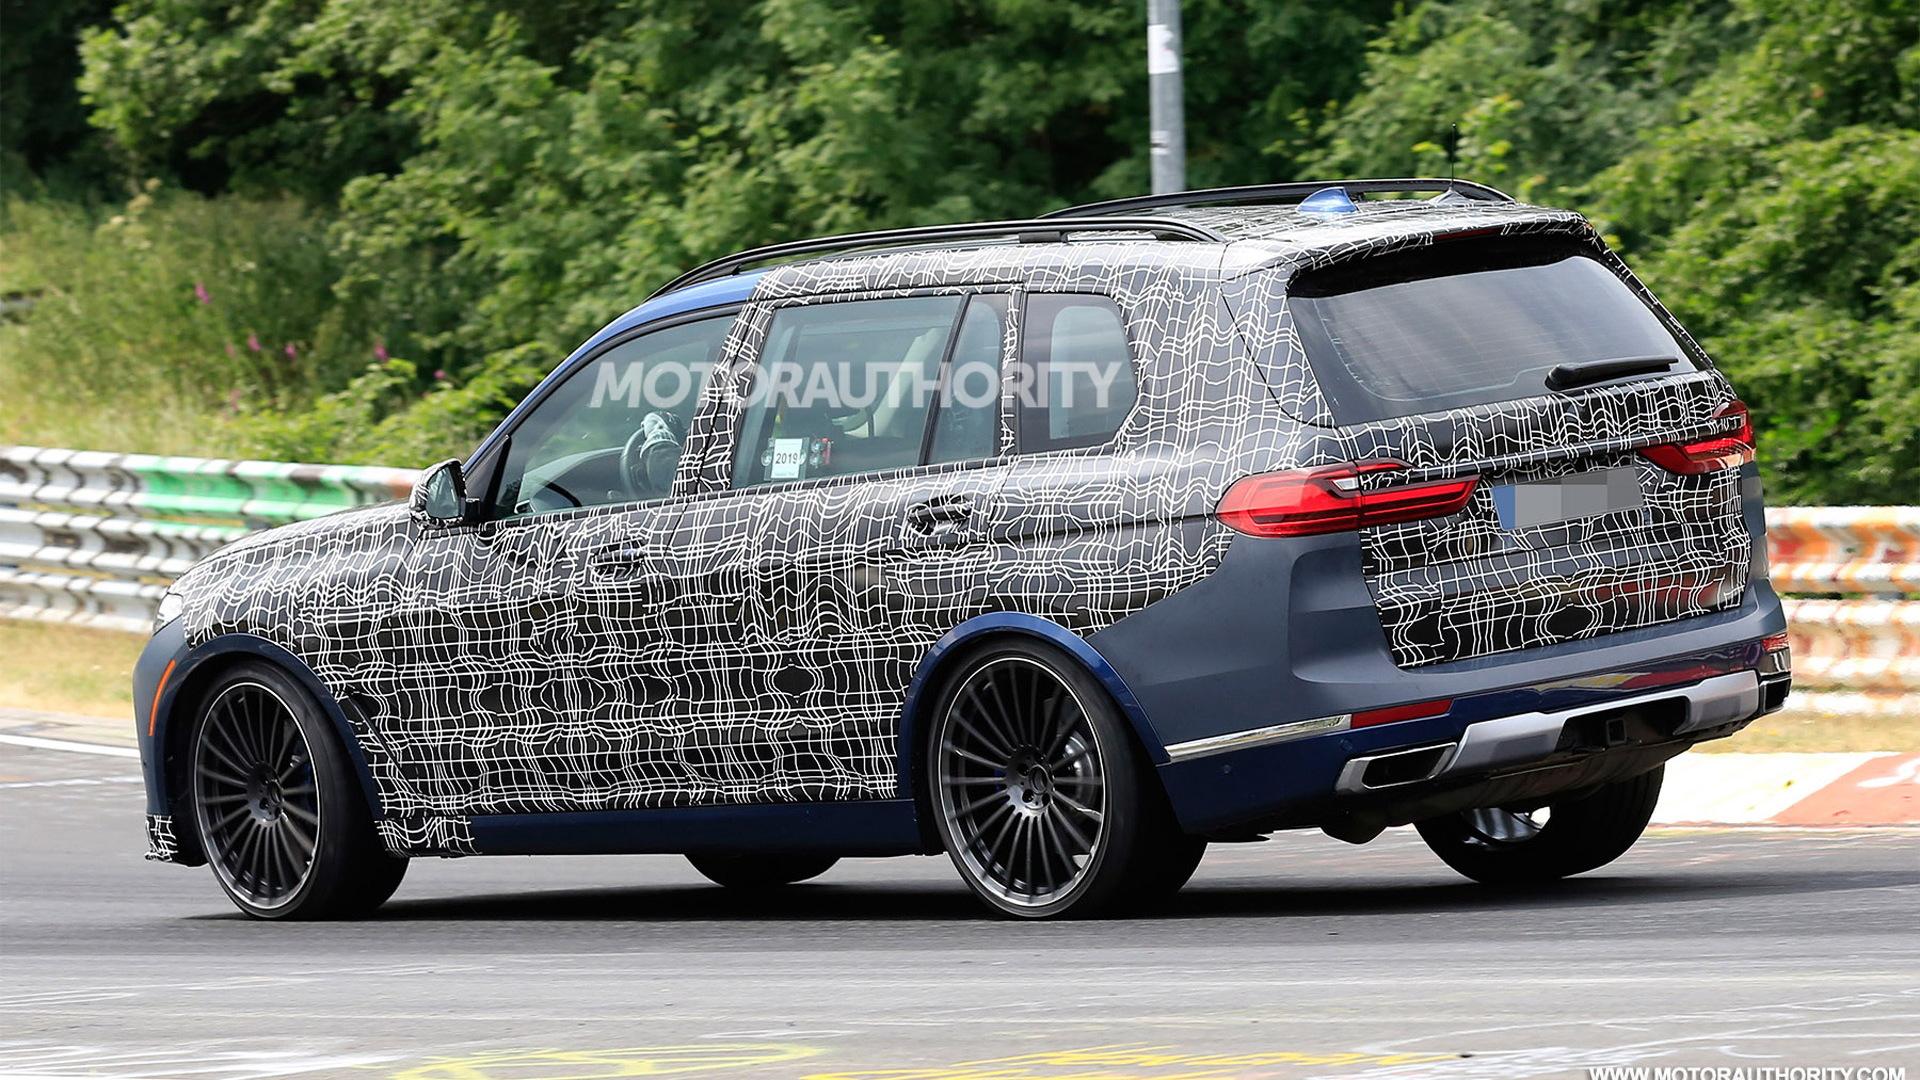 2020 BMW Alpina XB7 spy shots - Image via S. Baldauf/SB-Medien